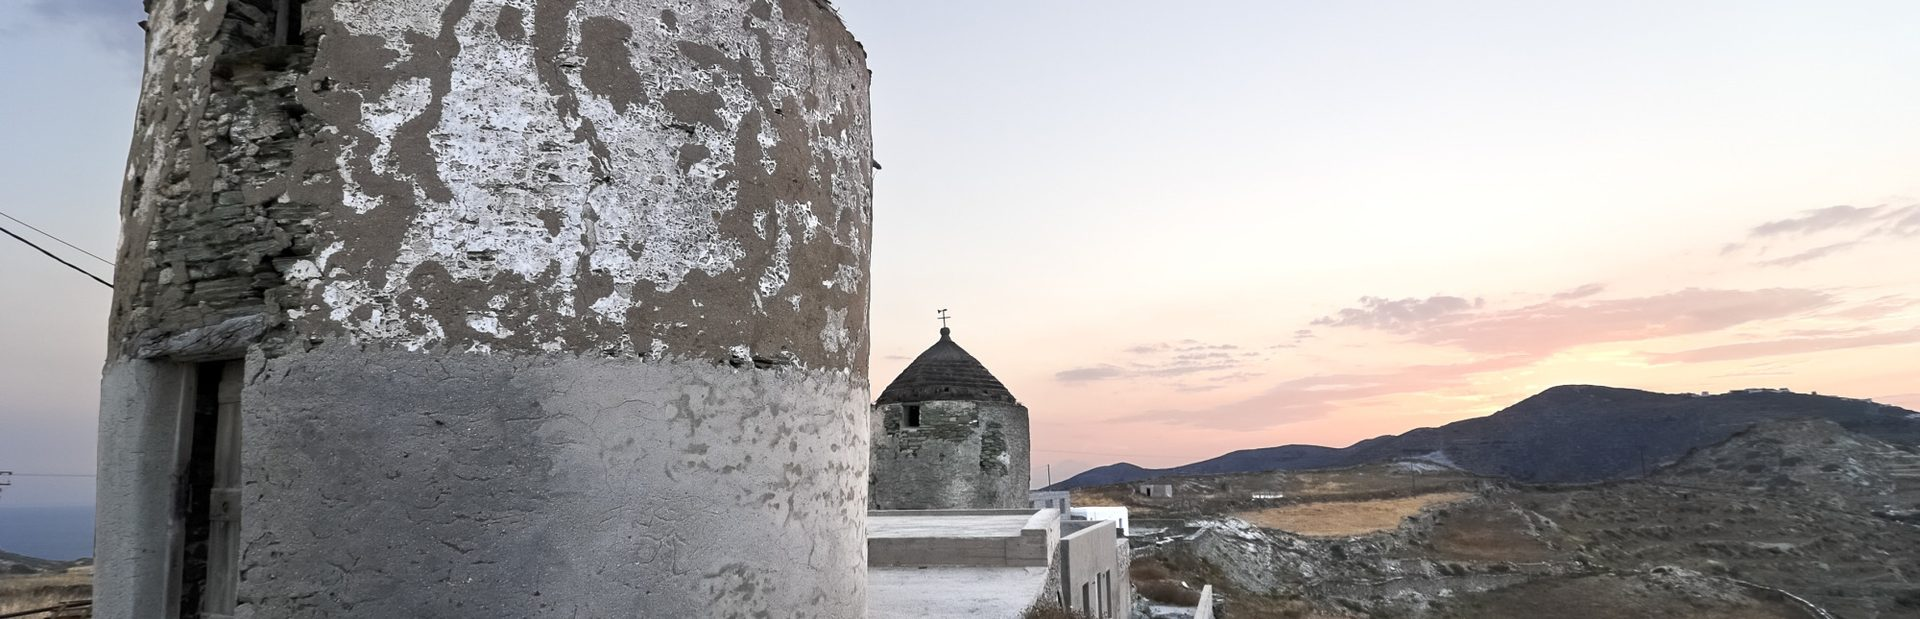 Folegandros climate photo